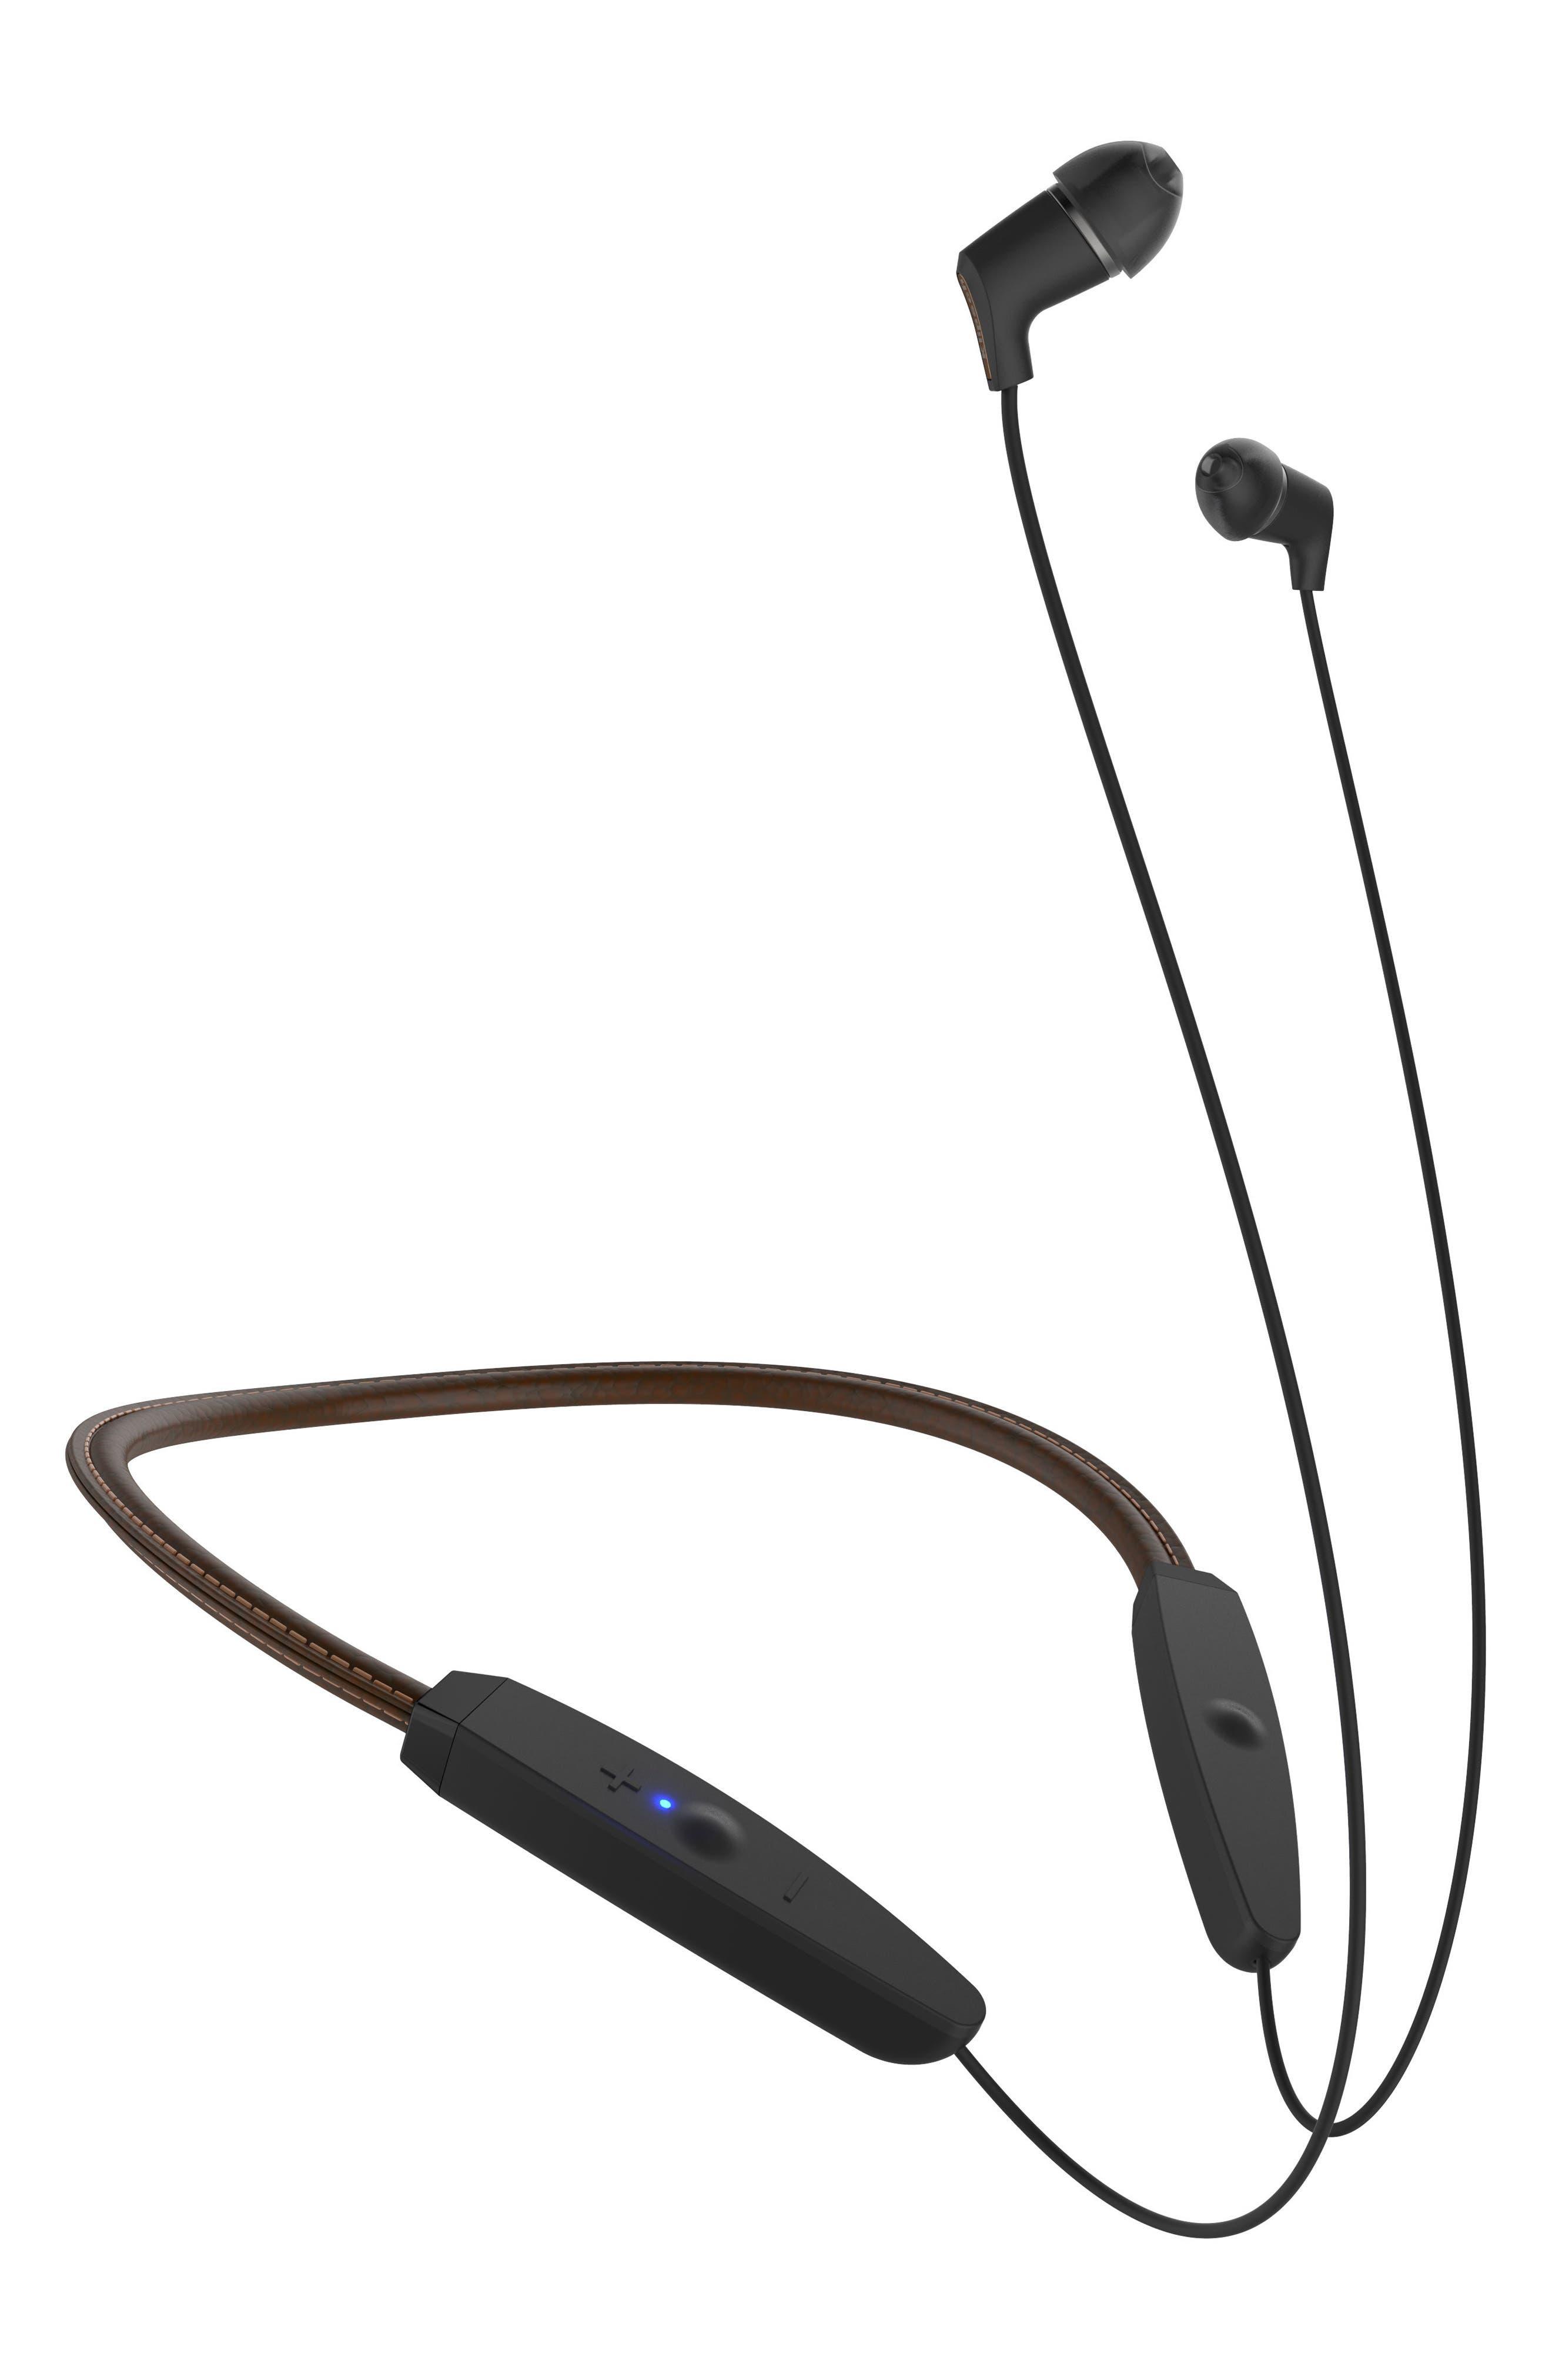 Klipsch Group R5 Neckband Wireless Earbuds